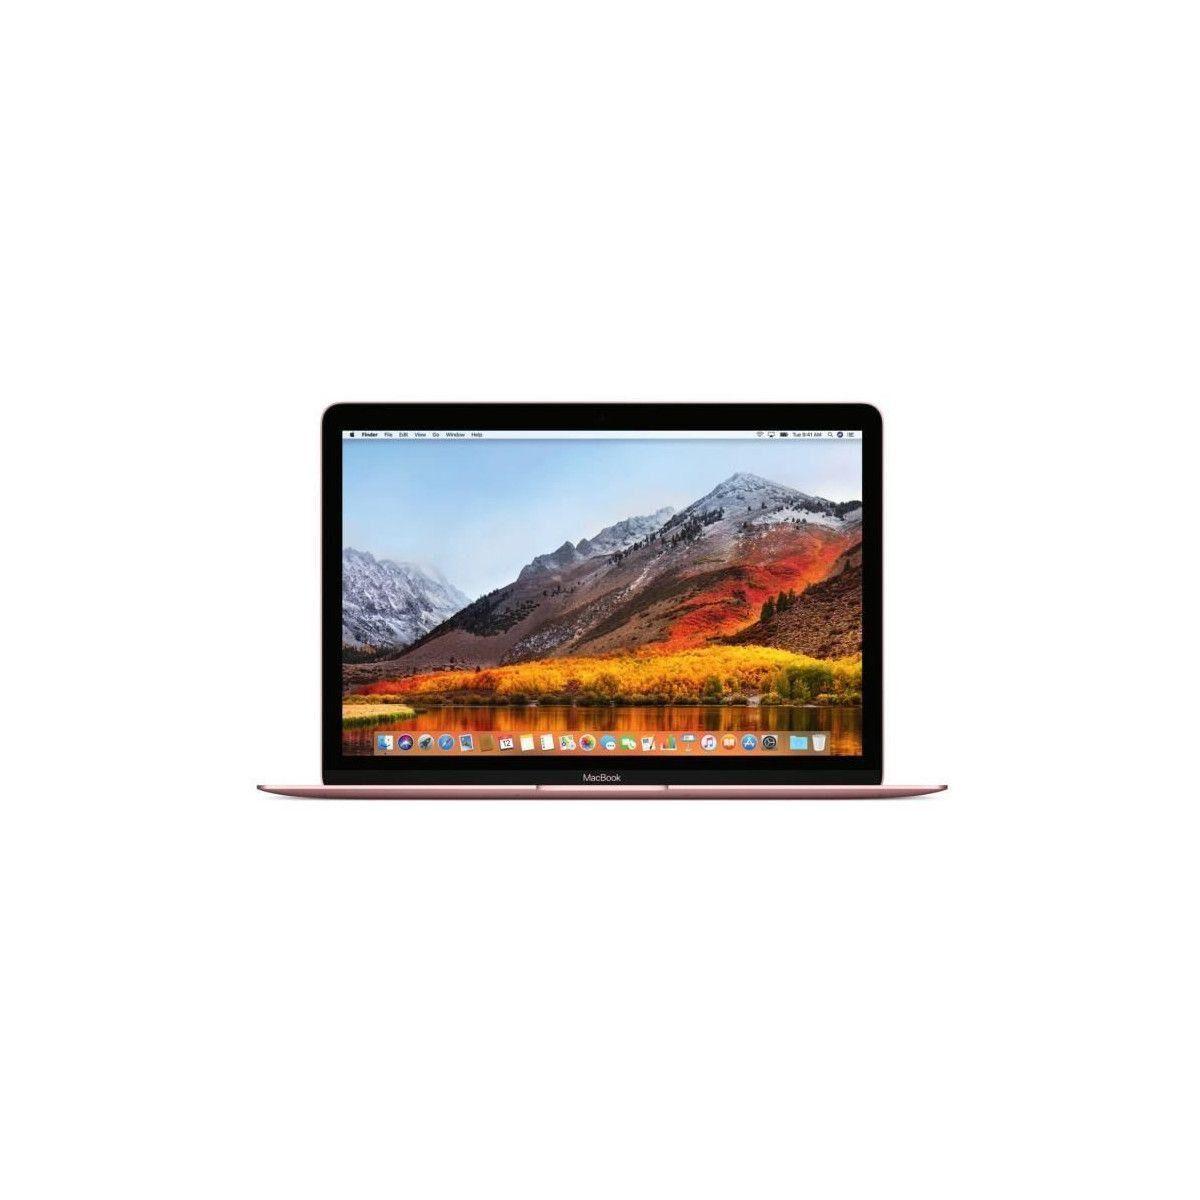 APPLE MacBook MNYN2FN/A - 12 pouces Retina - Intel Core i5 - RAM 8Go - Stockage 512Go SSD - Rose Gold